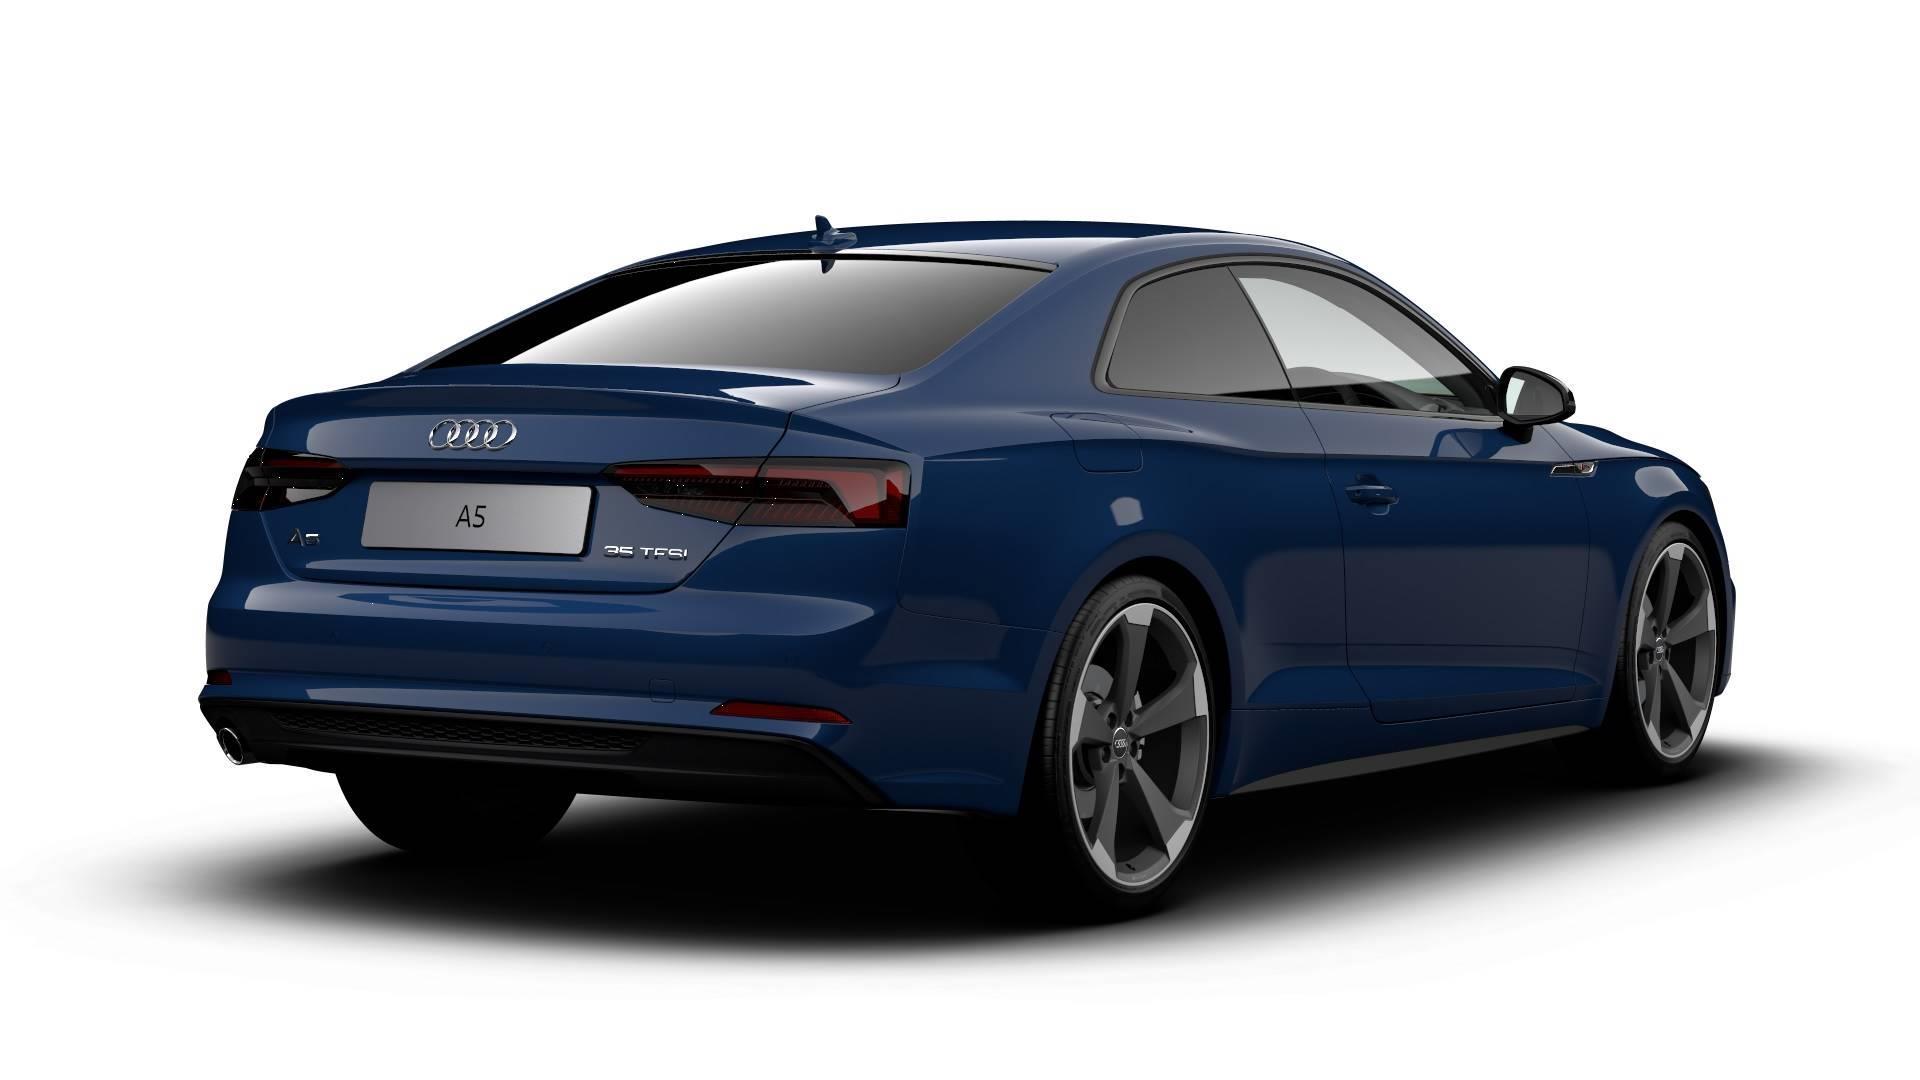 2019 Audi A5 Black Edition News and Information - .com | Audi A5 Sportback Black Edition |  | Concept Carz